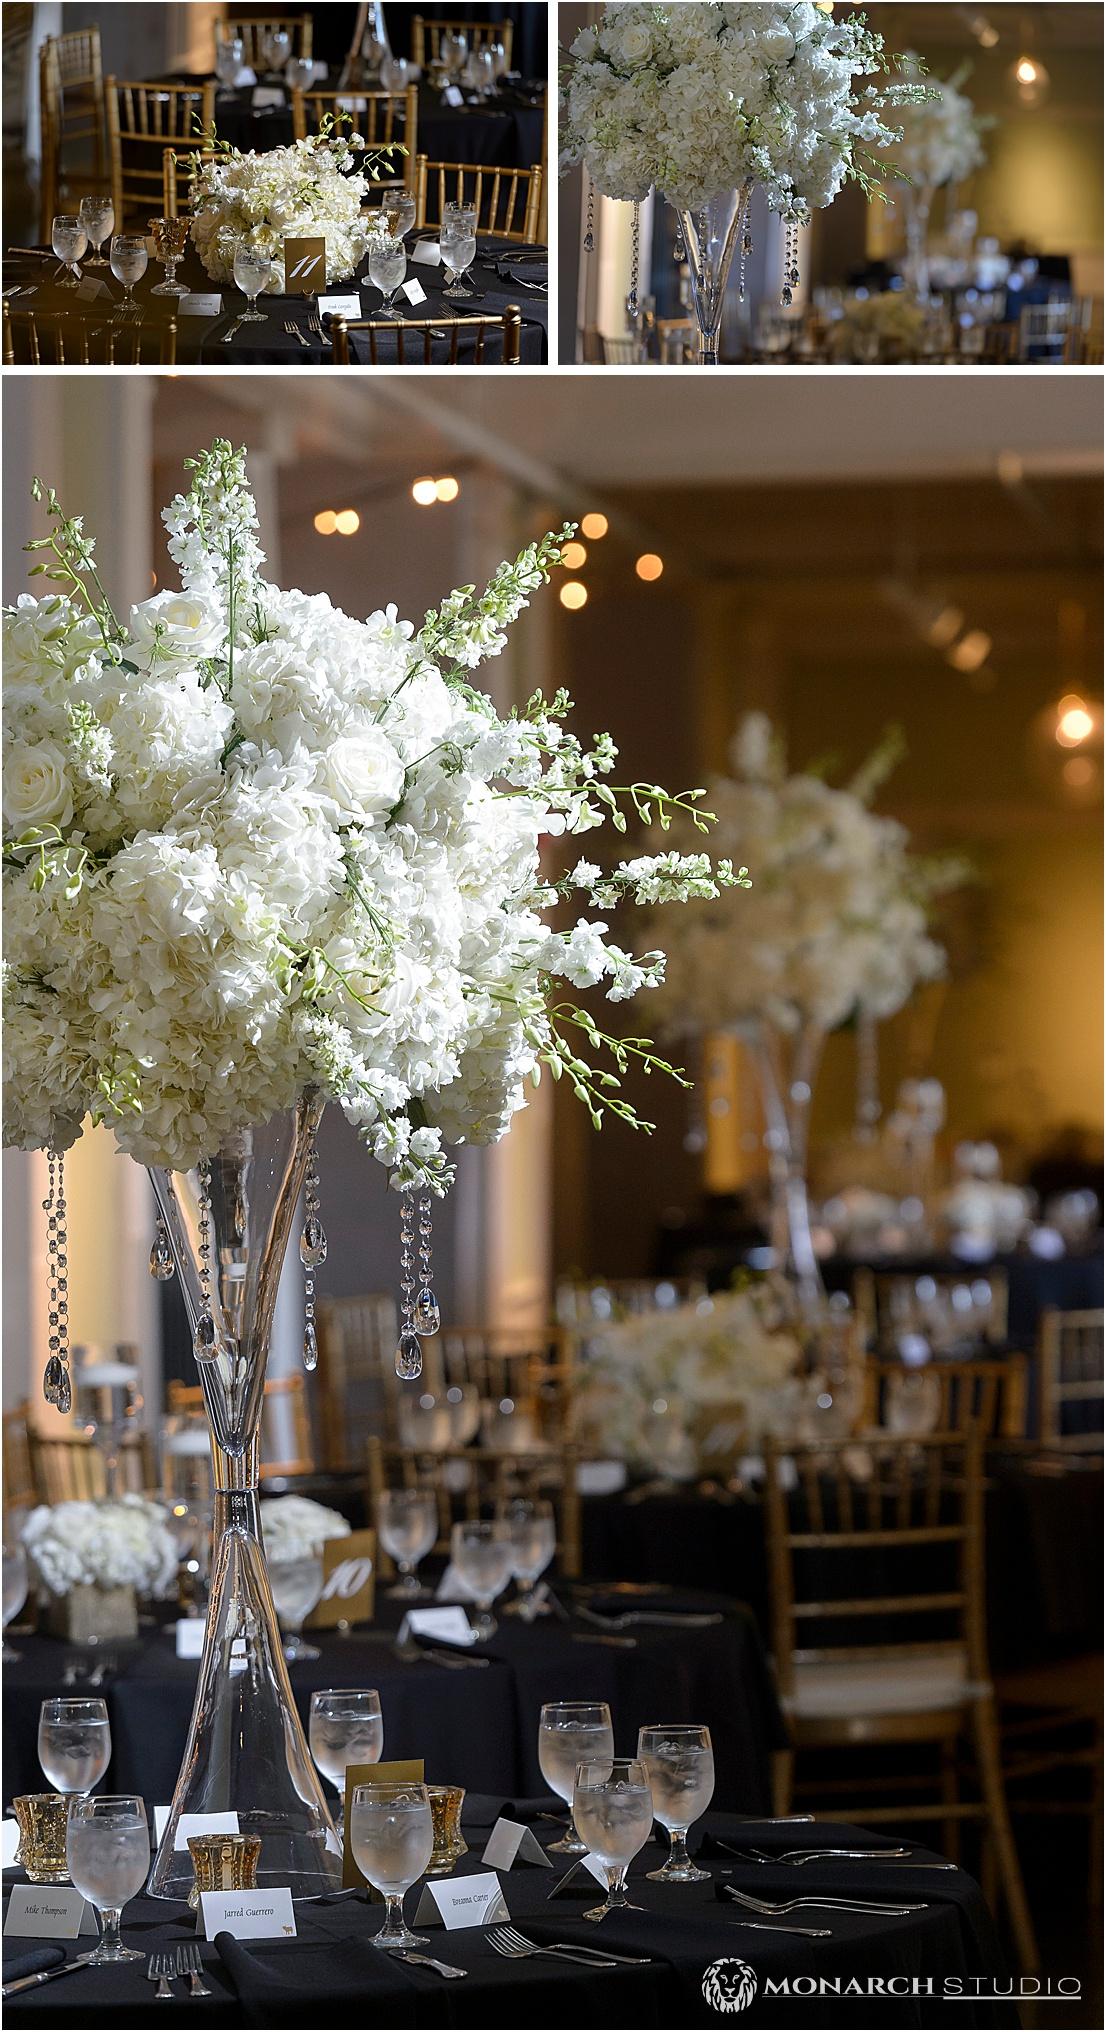 st-augustine-high-end-wedding-photographers-026.jpg